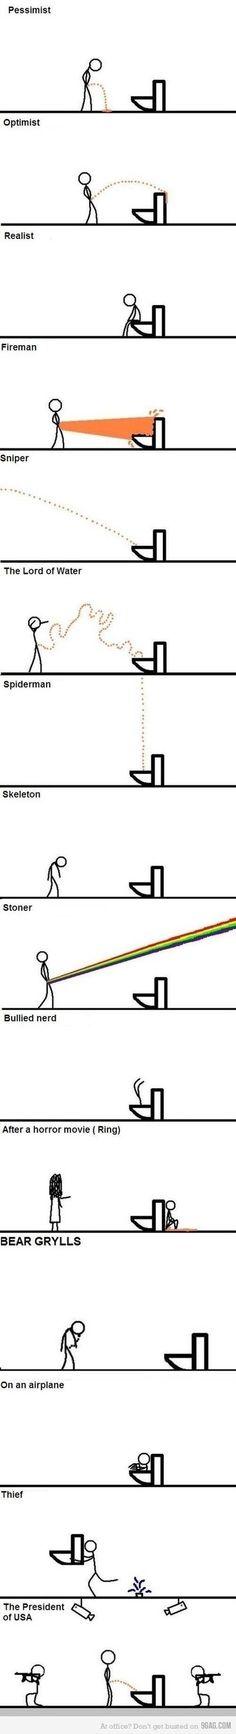 Hahahahahahahahaha!